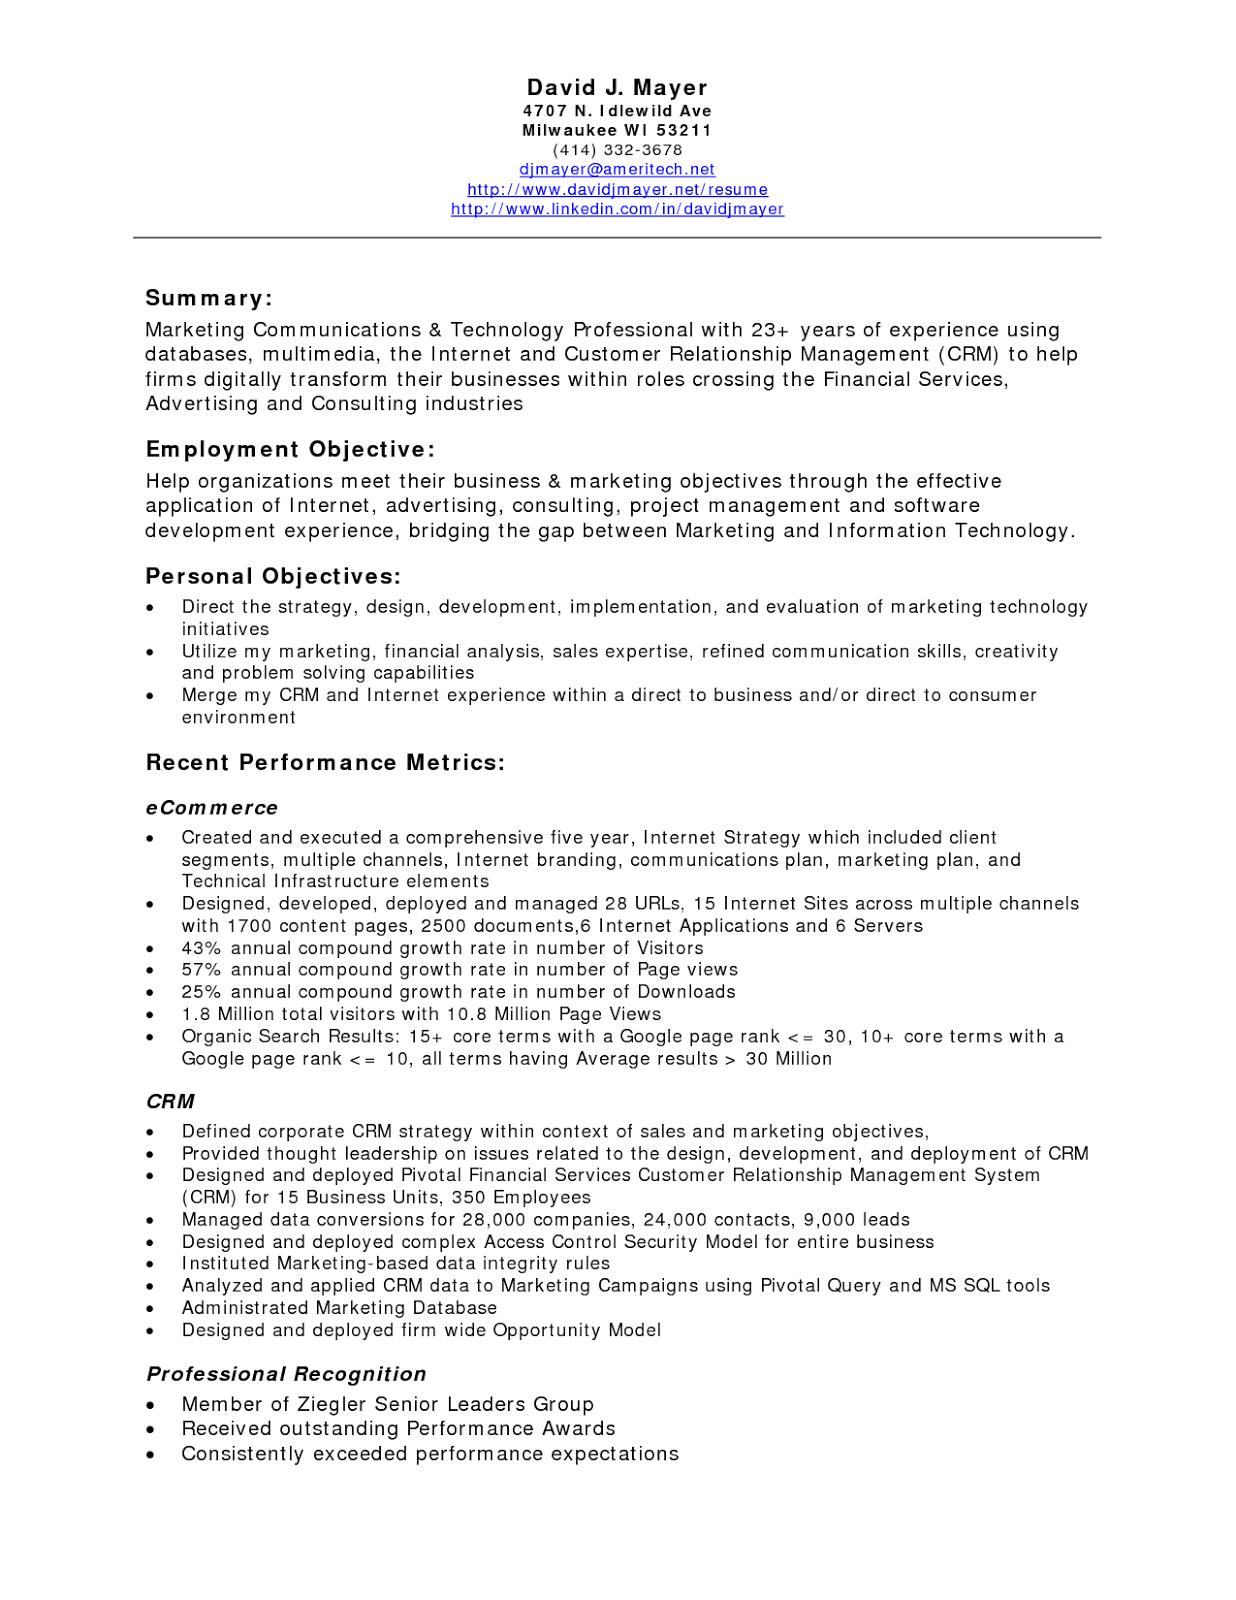 Fresh Essays cover letter for communication consultant